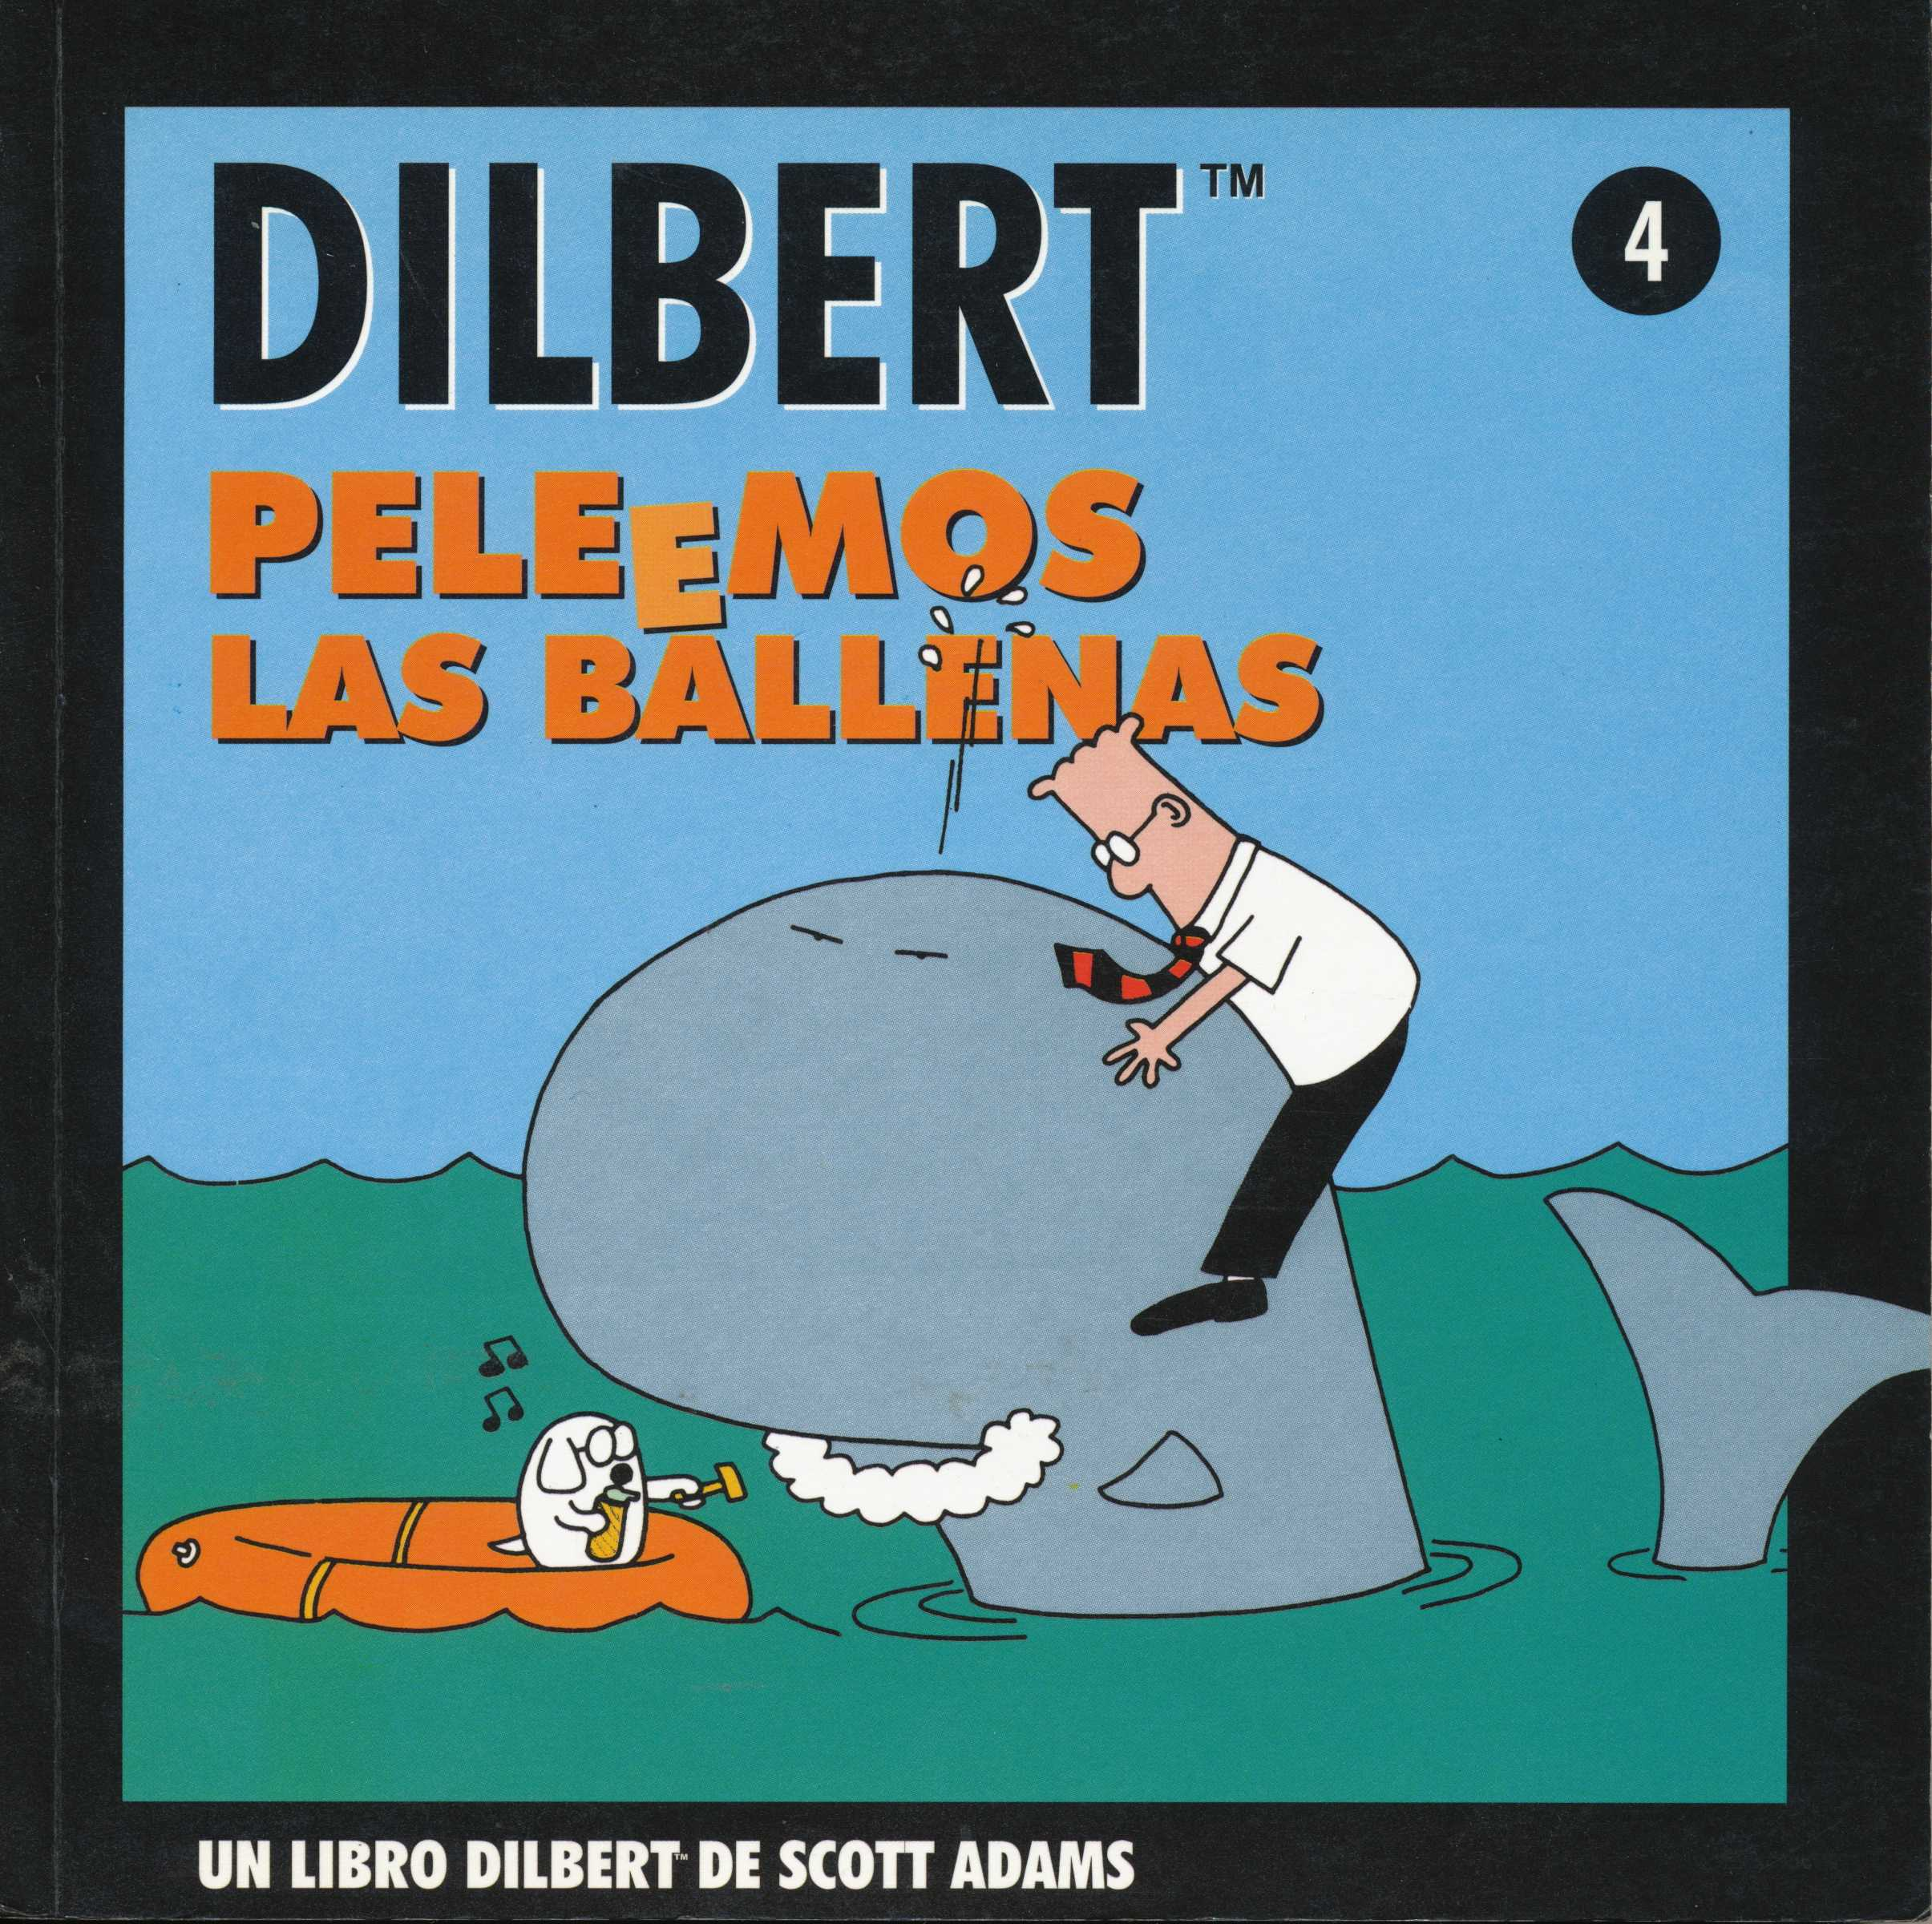 Dilbert 4. Peleemos Las Ballenas